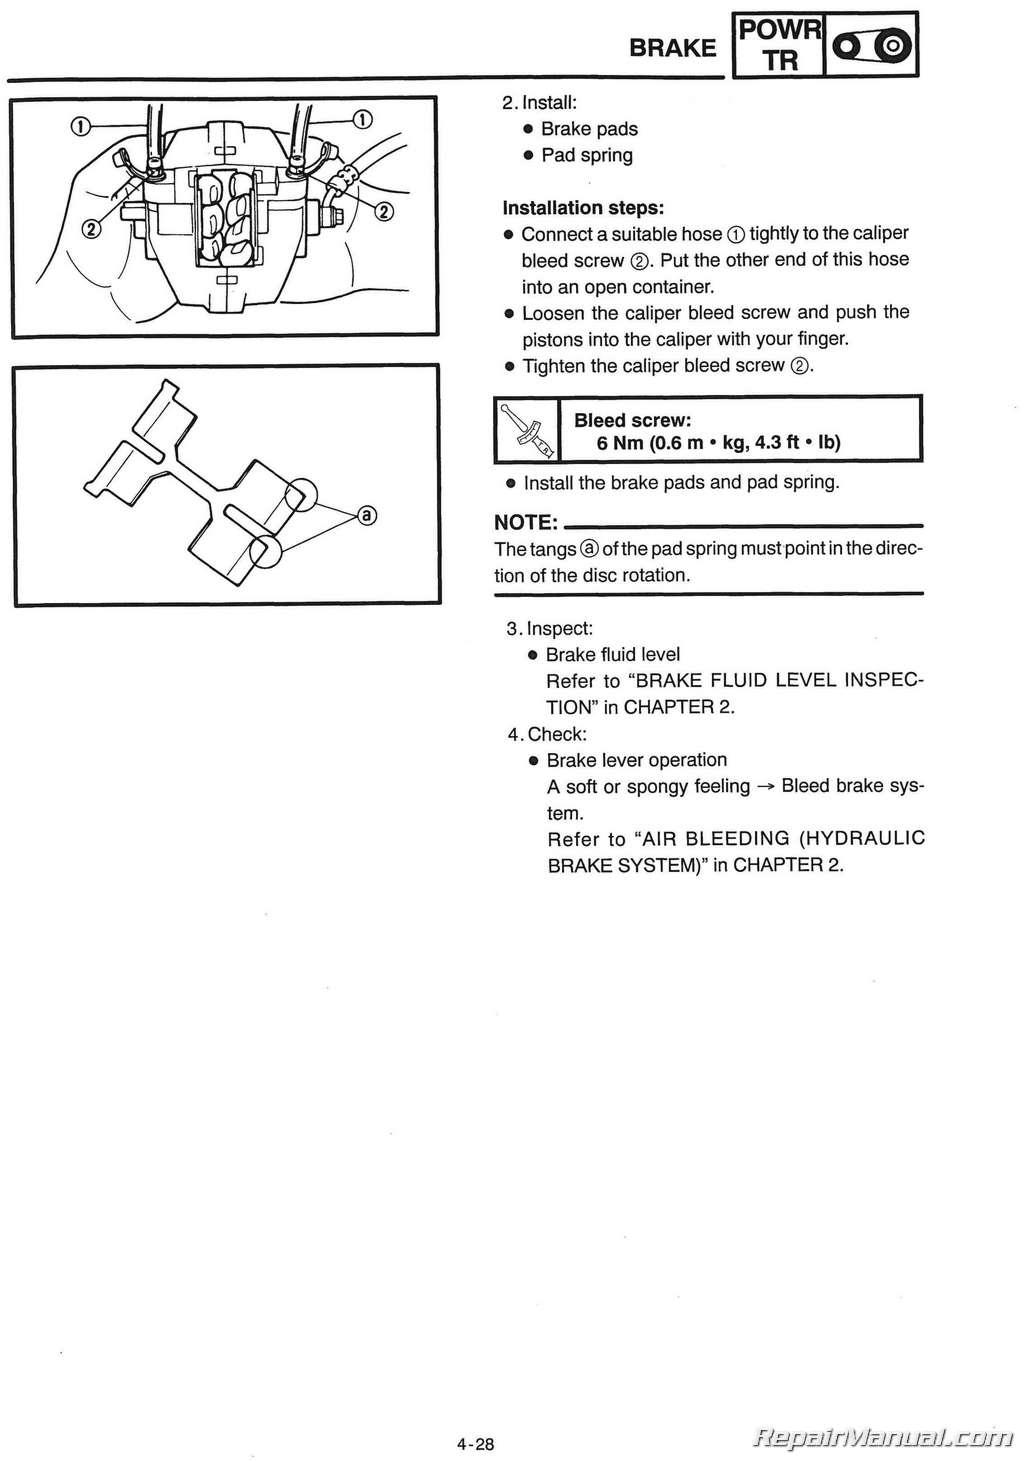 2000 Yamaha Phazer Wiring Diagram Start Building A 2001 Raptor 660 1999 Snowmobile Service Manual Pz500 Vt500xl Rh Repairmanual Com Big Bear 350 Tach